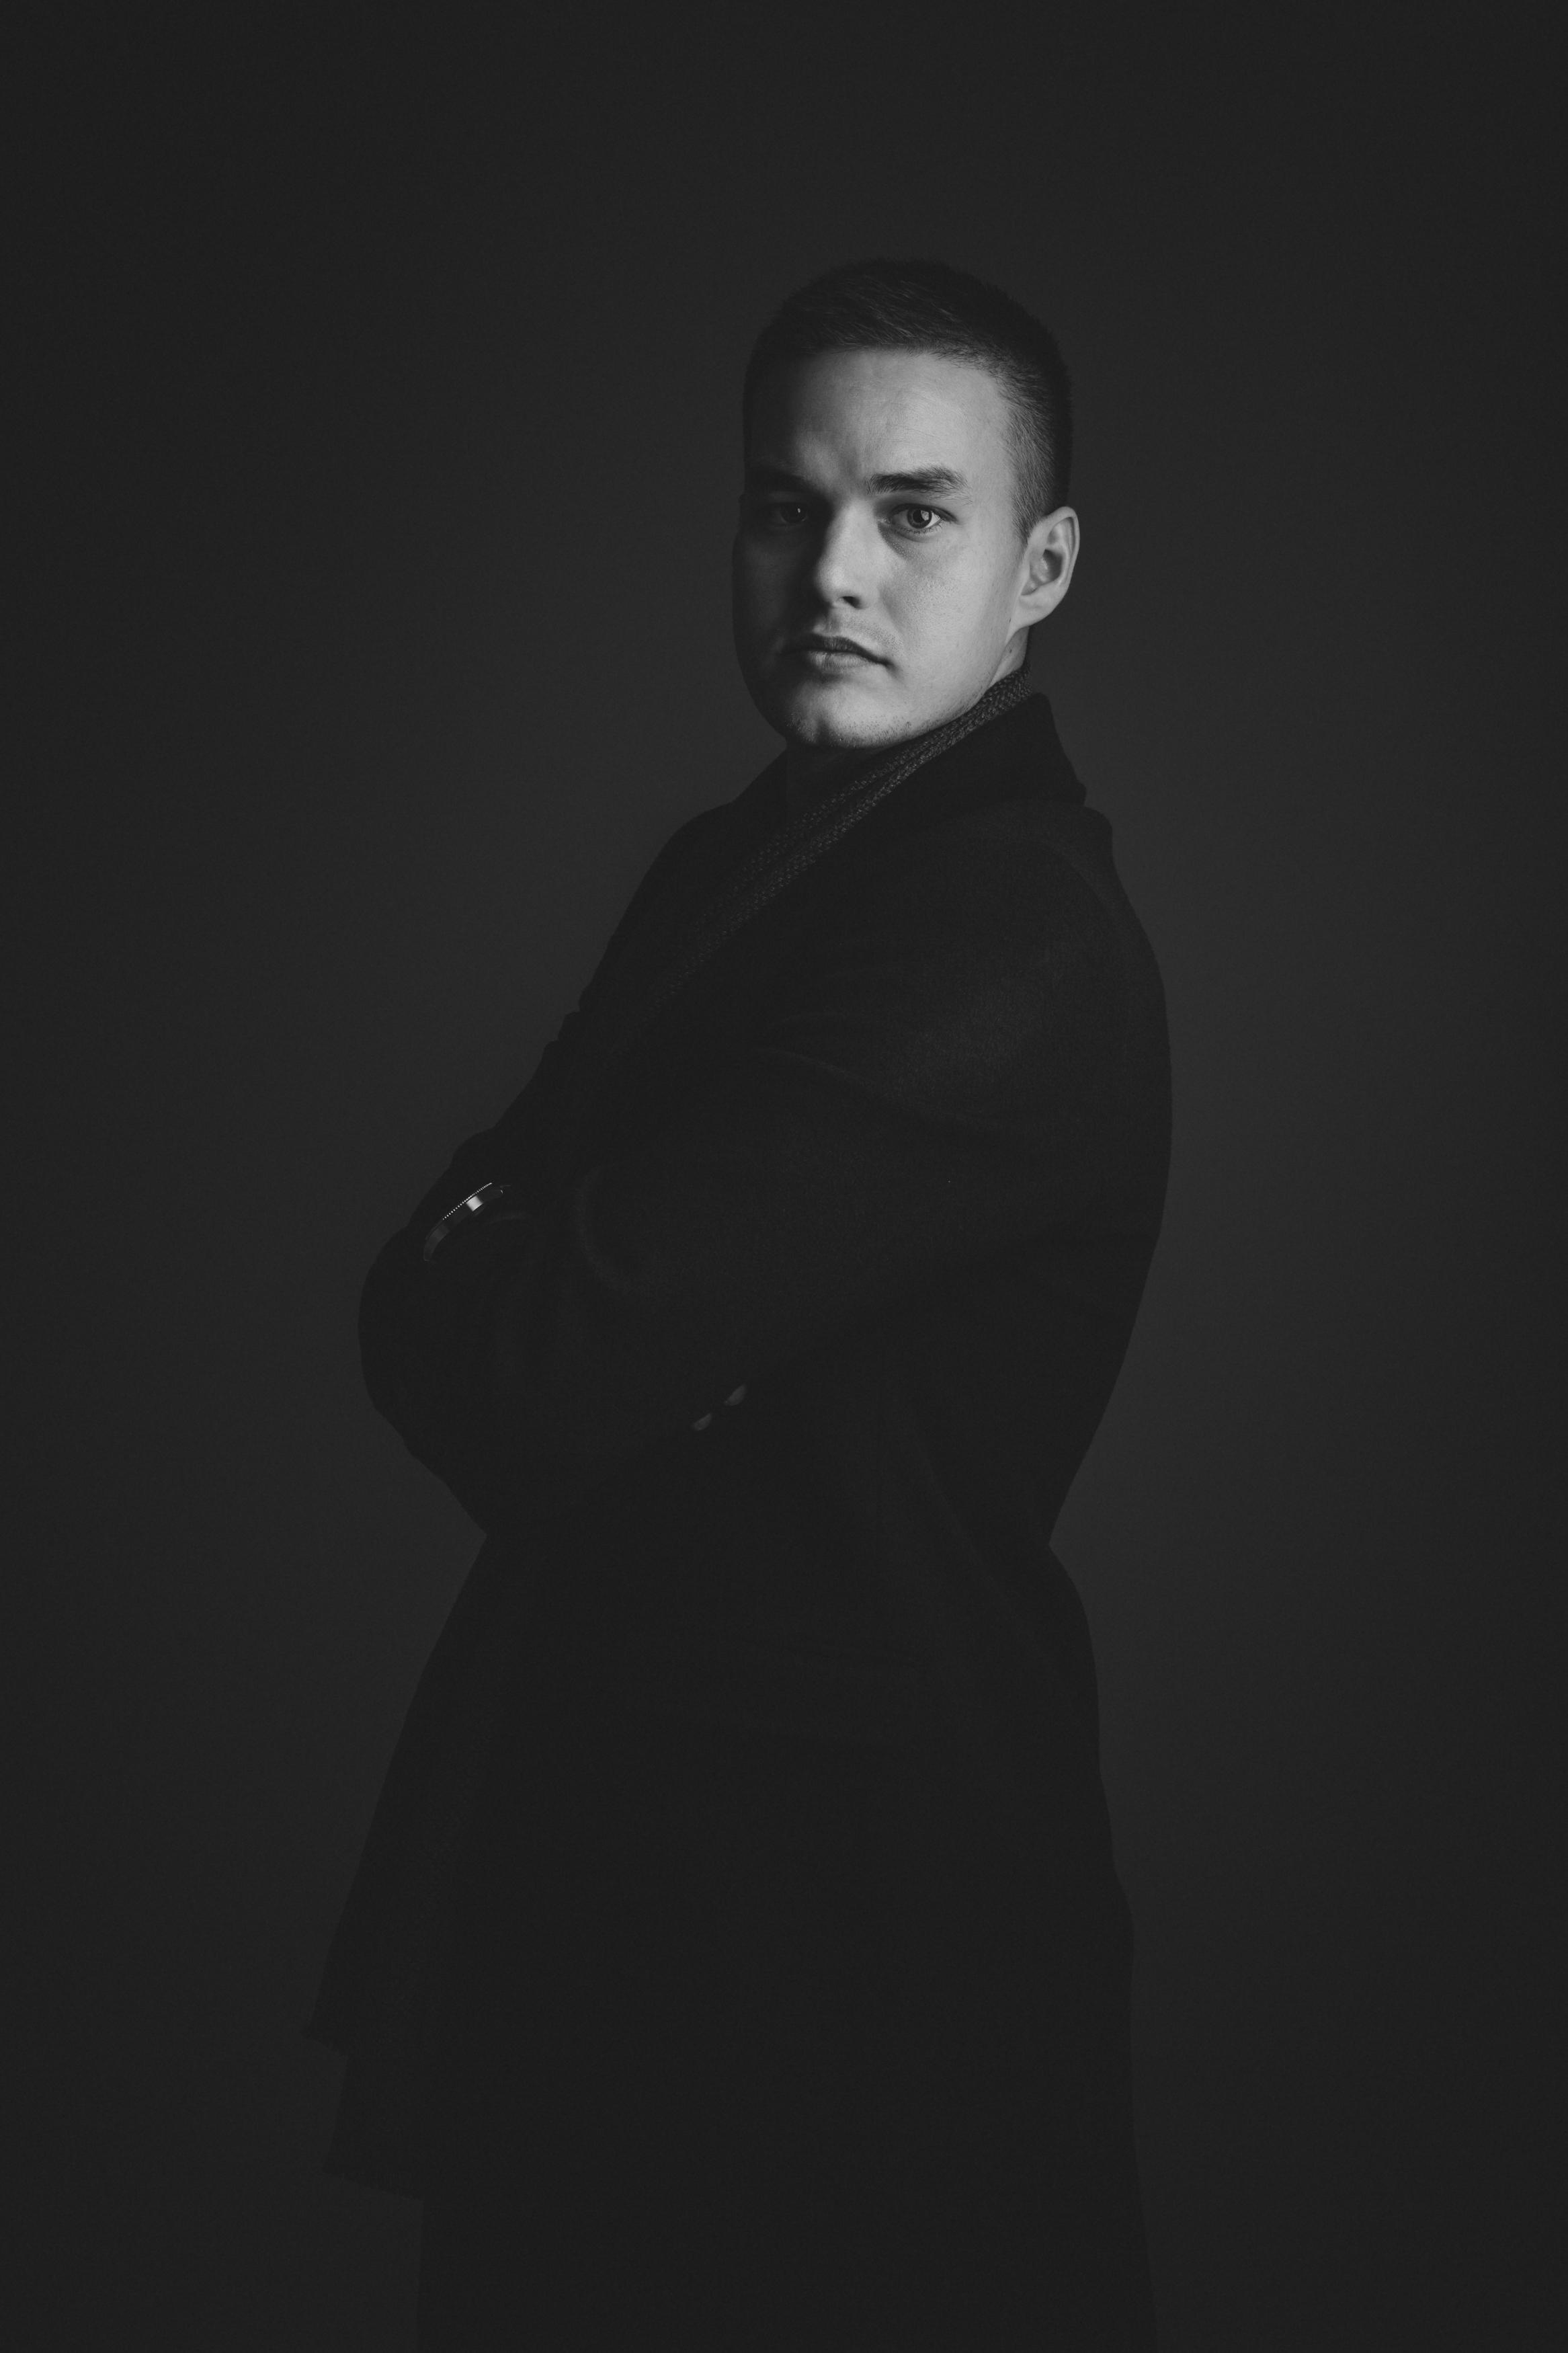 Portree pildistamine fotostuudios